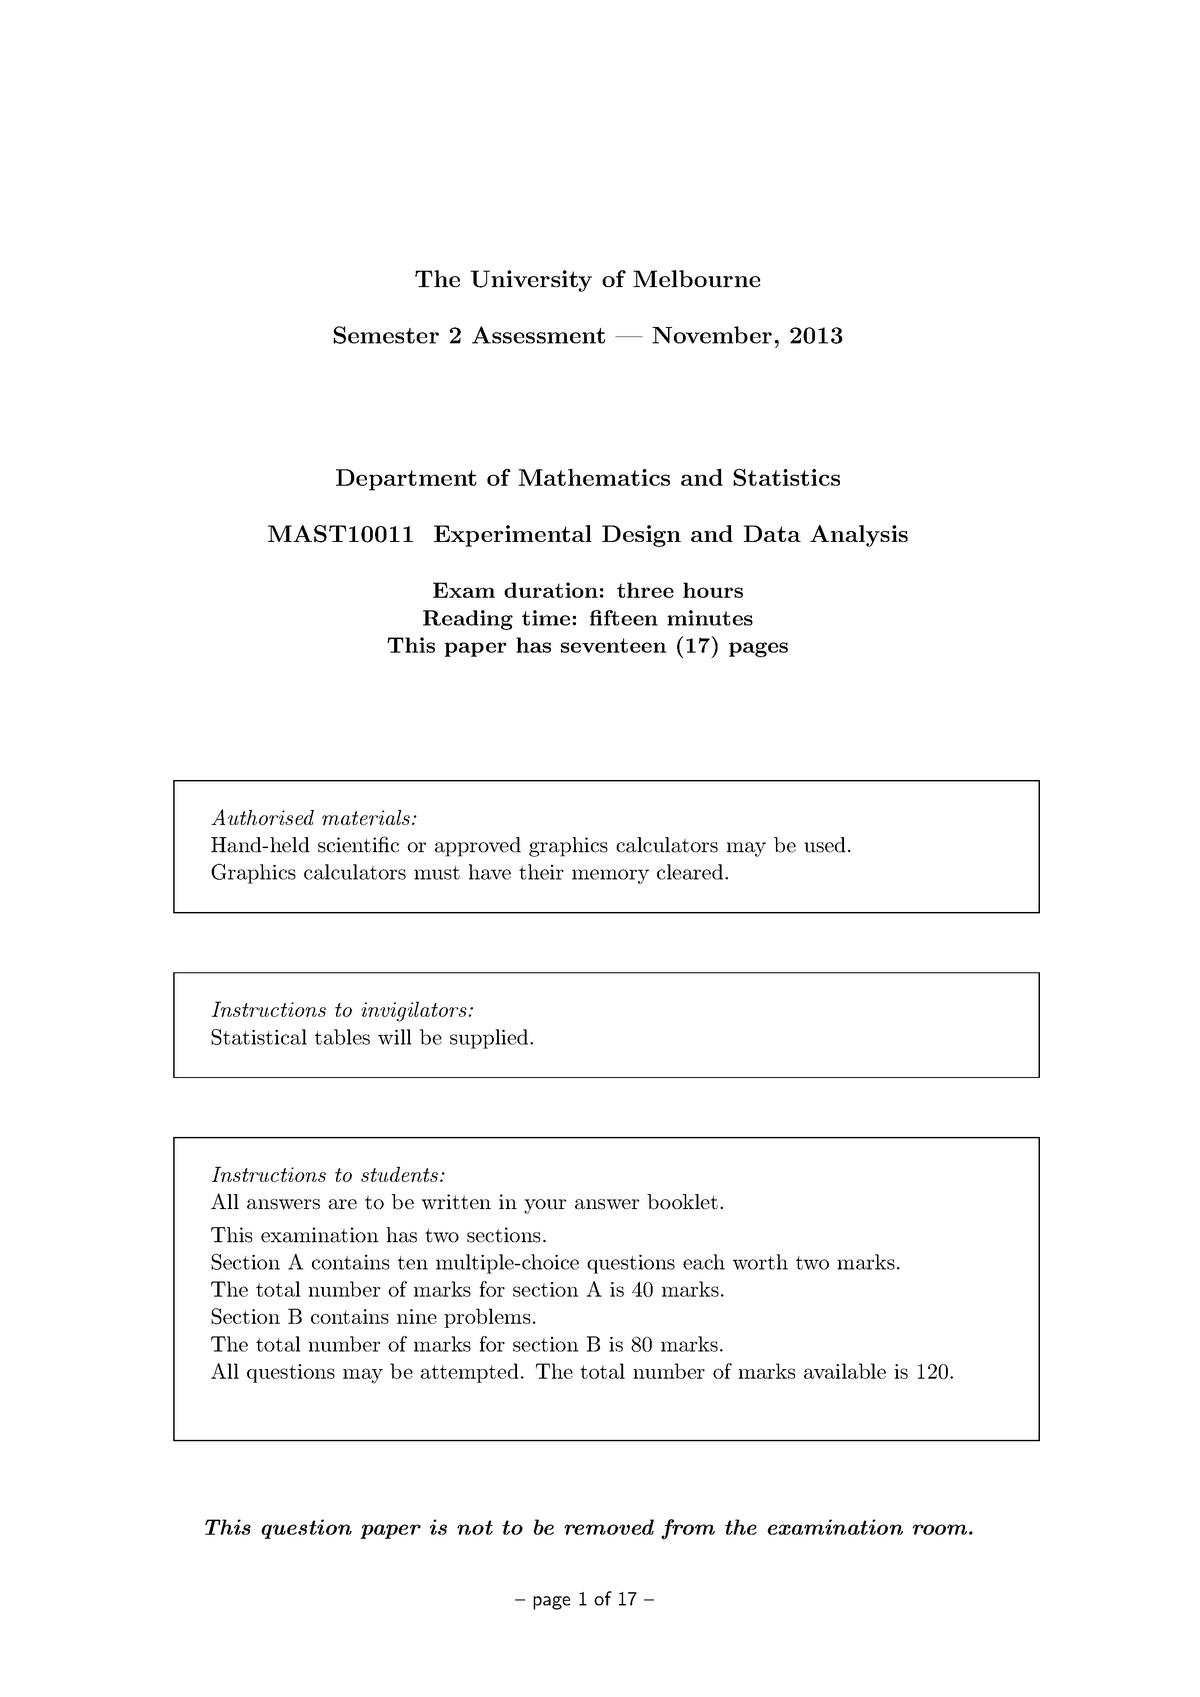 Exam 2013 - MAST10011: Experimental Design And Data Analysis - StuDocu